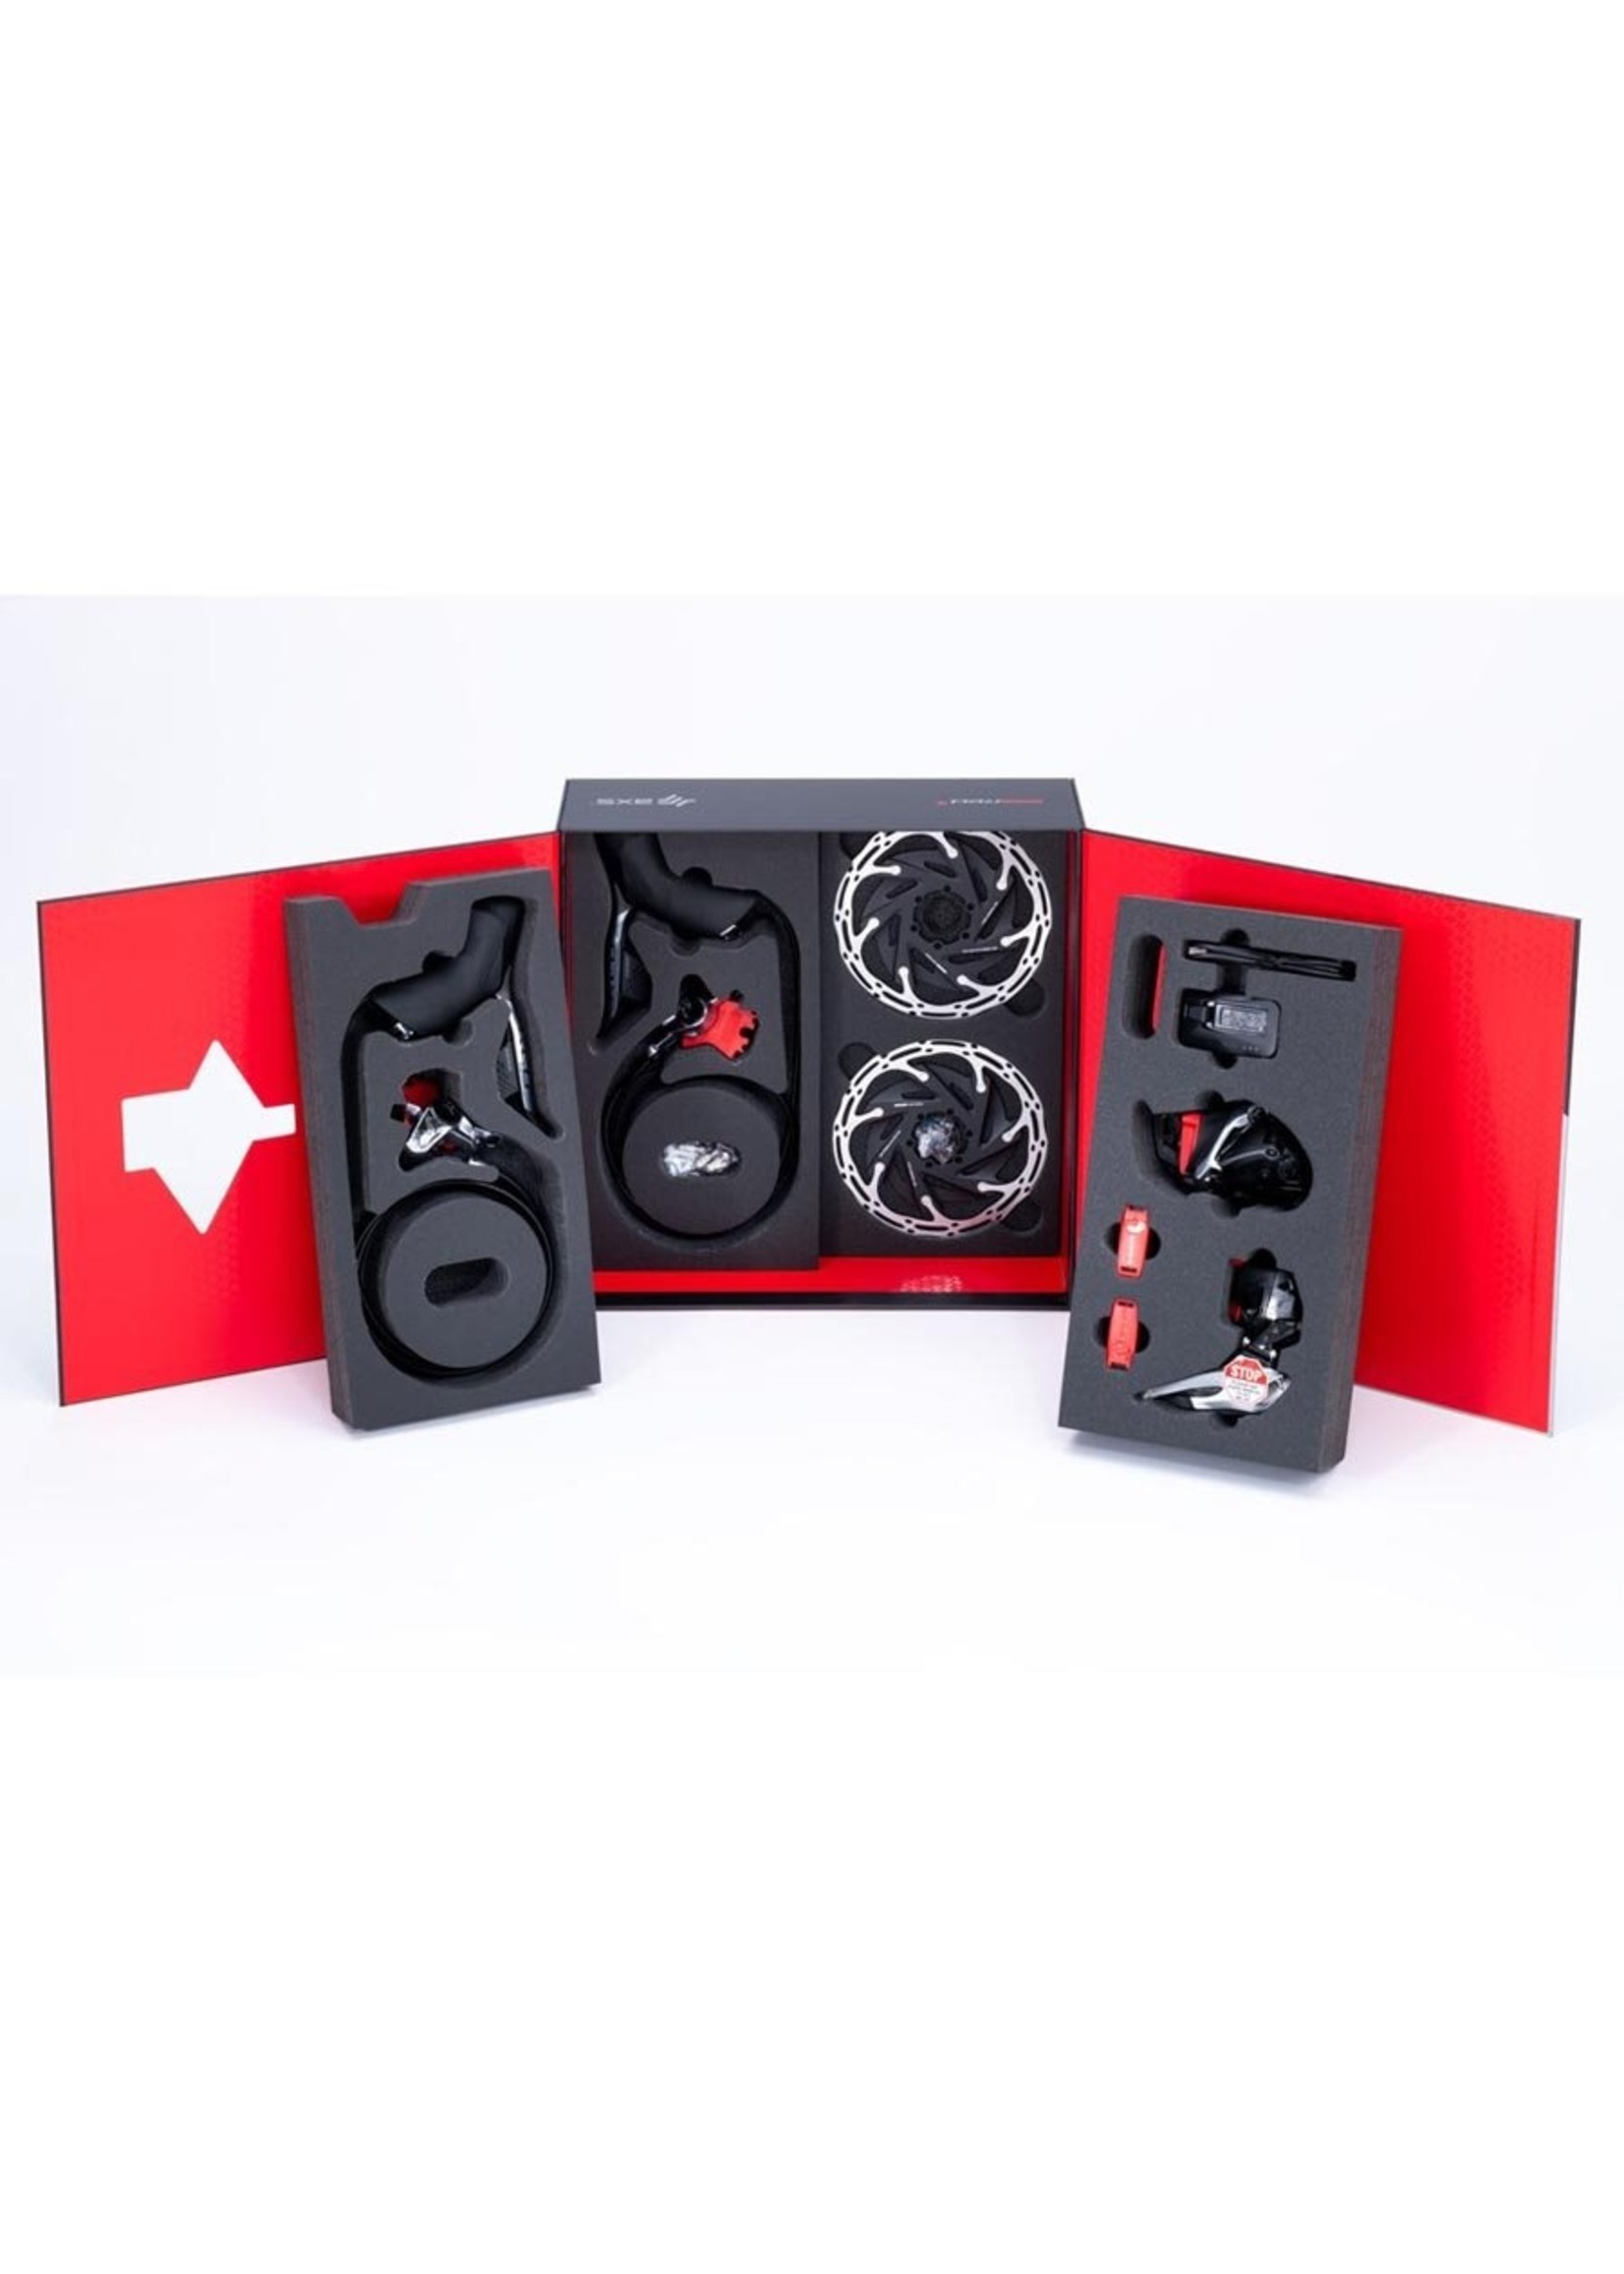 Sram SRAM, Red eTap AXS HRD, Build Kit, 2x, Hydraulic Disc, Flat Mount, Centerlock, Kit